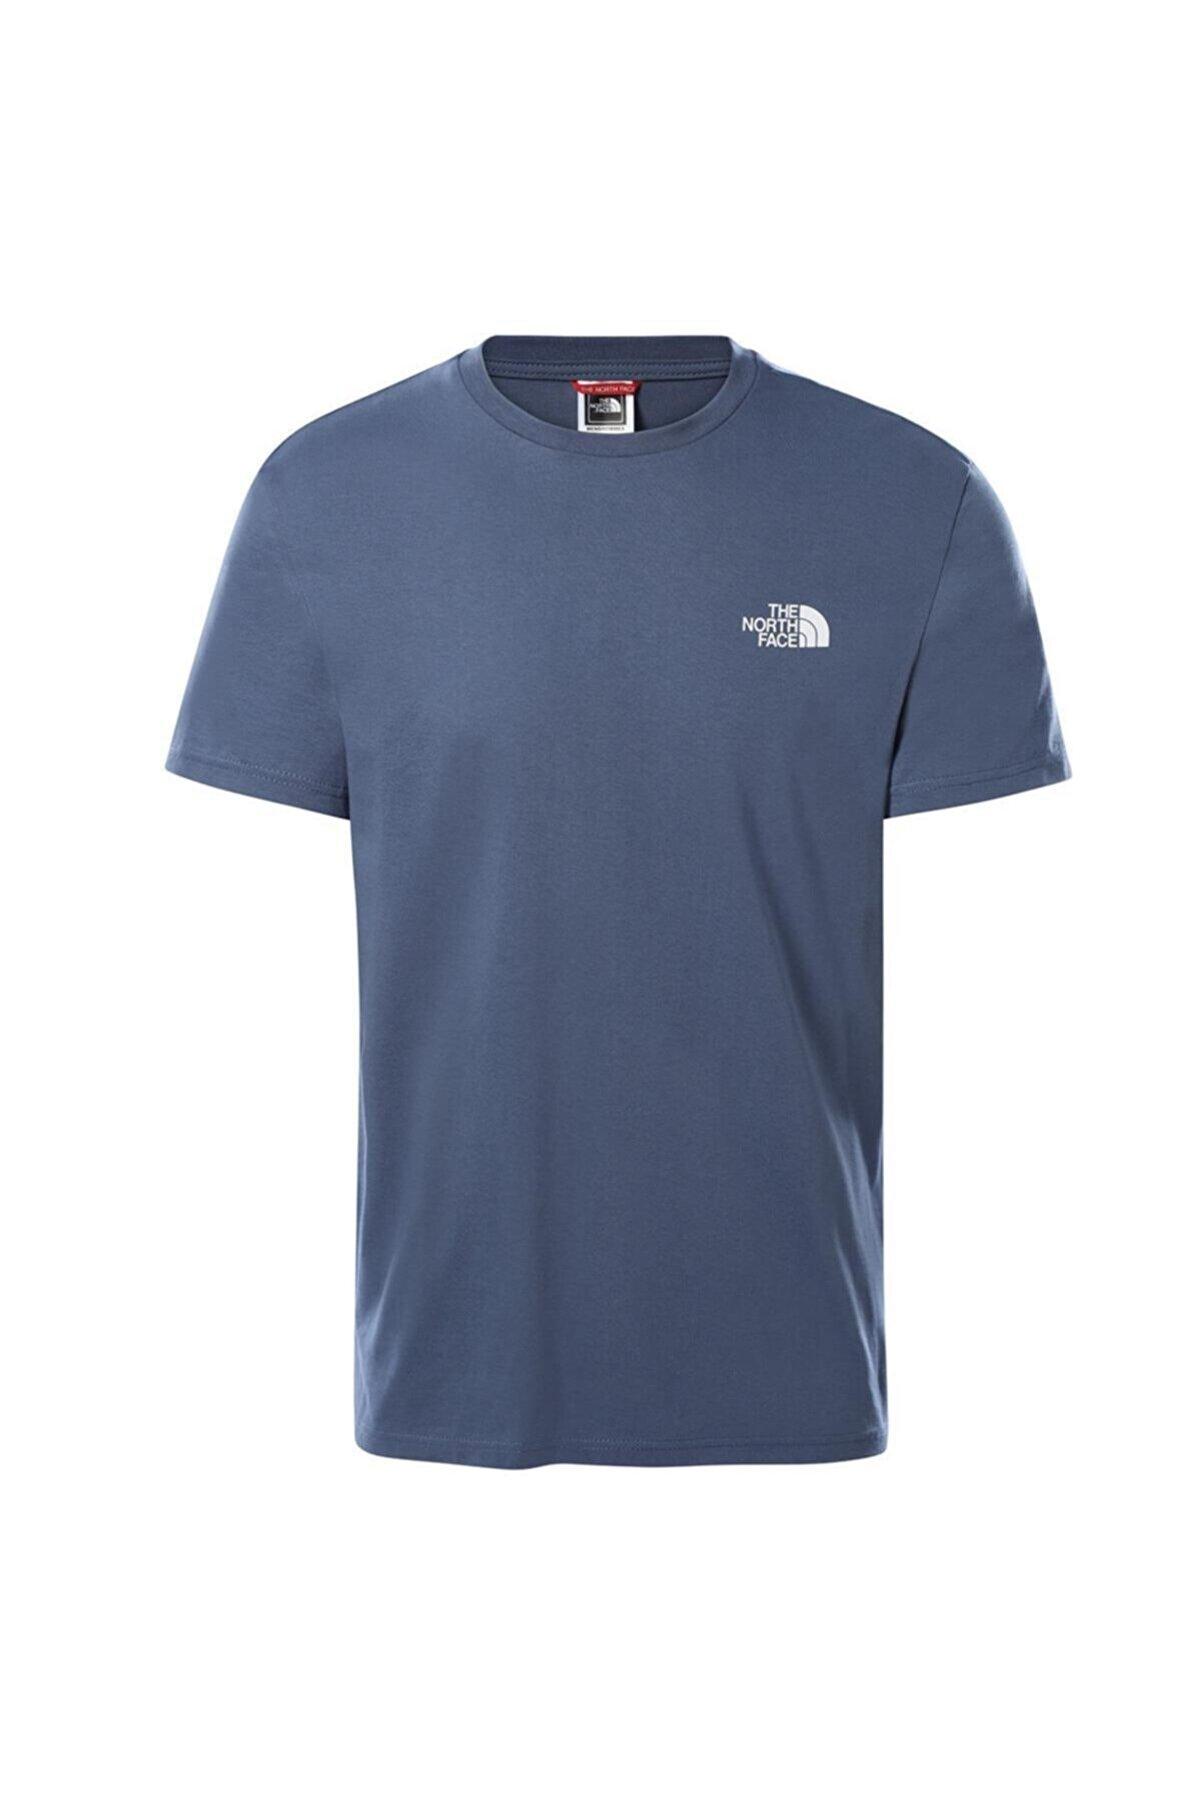 The North Face Erkek Mavi Simple Dome  T-shirt